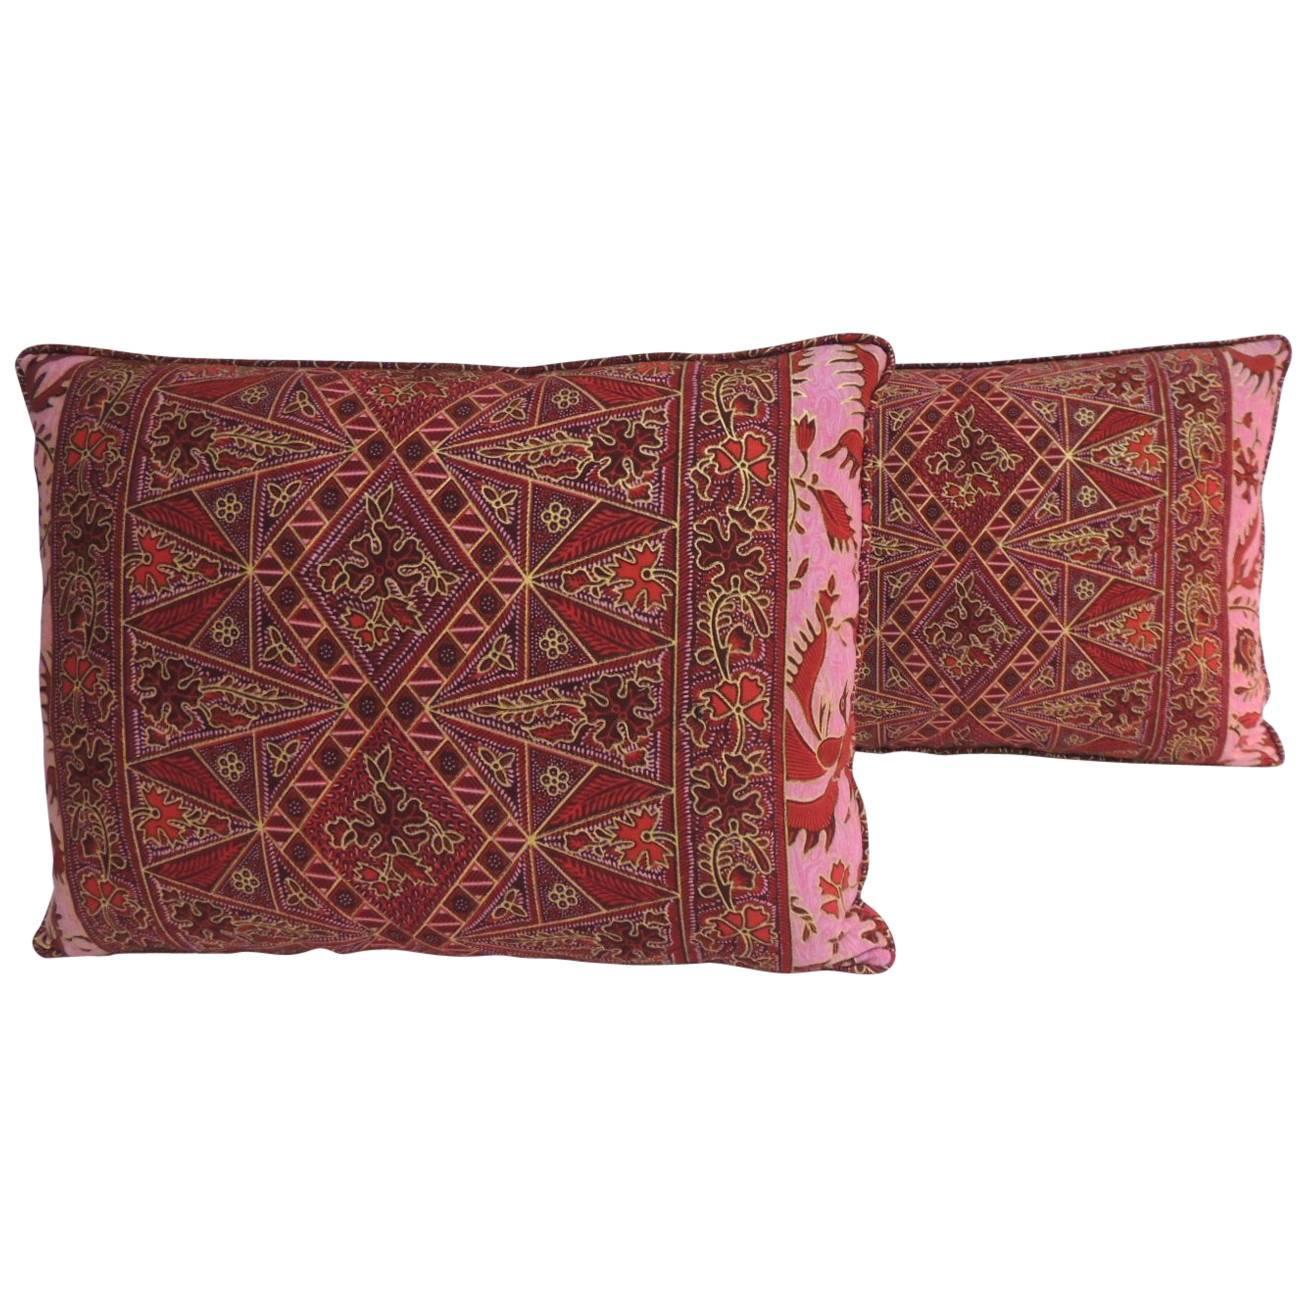 Pair of Hand-blocked Red and Pink Batik Bolster Decorative Pillows